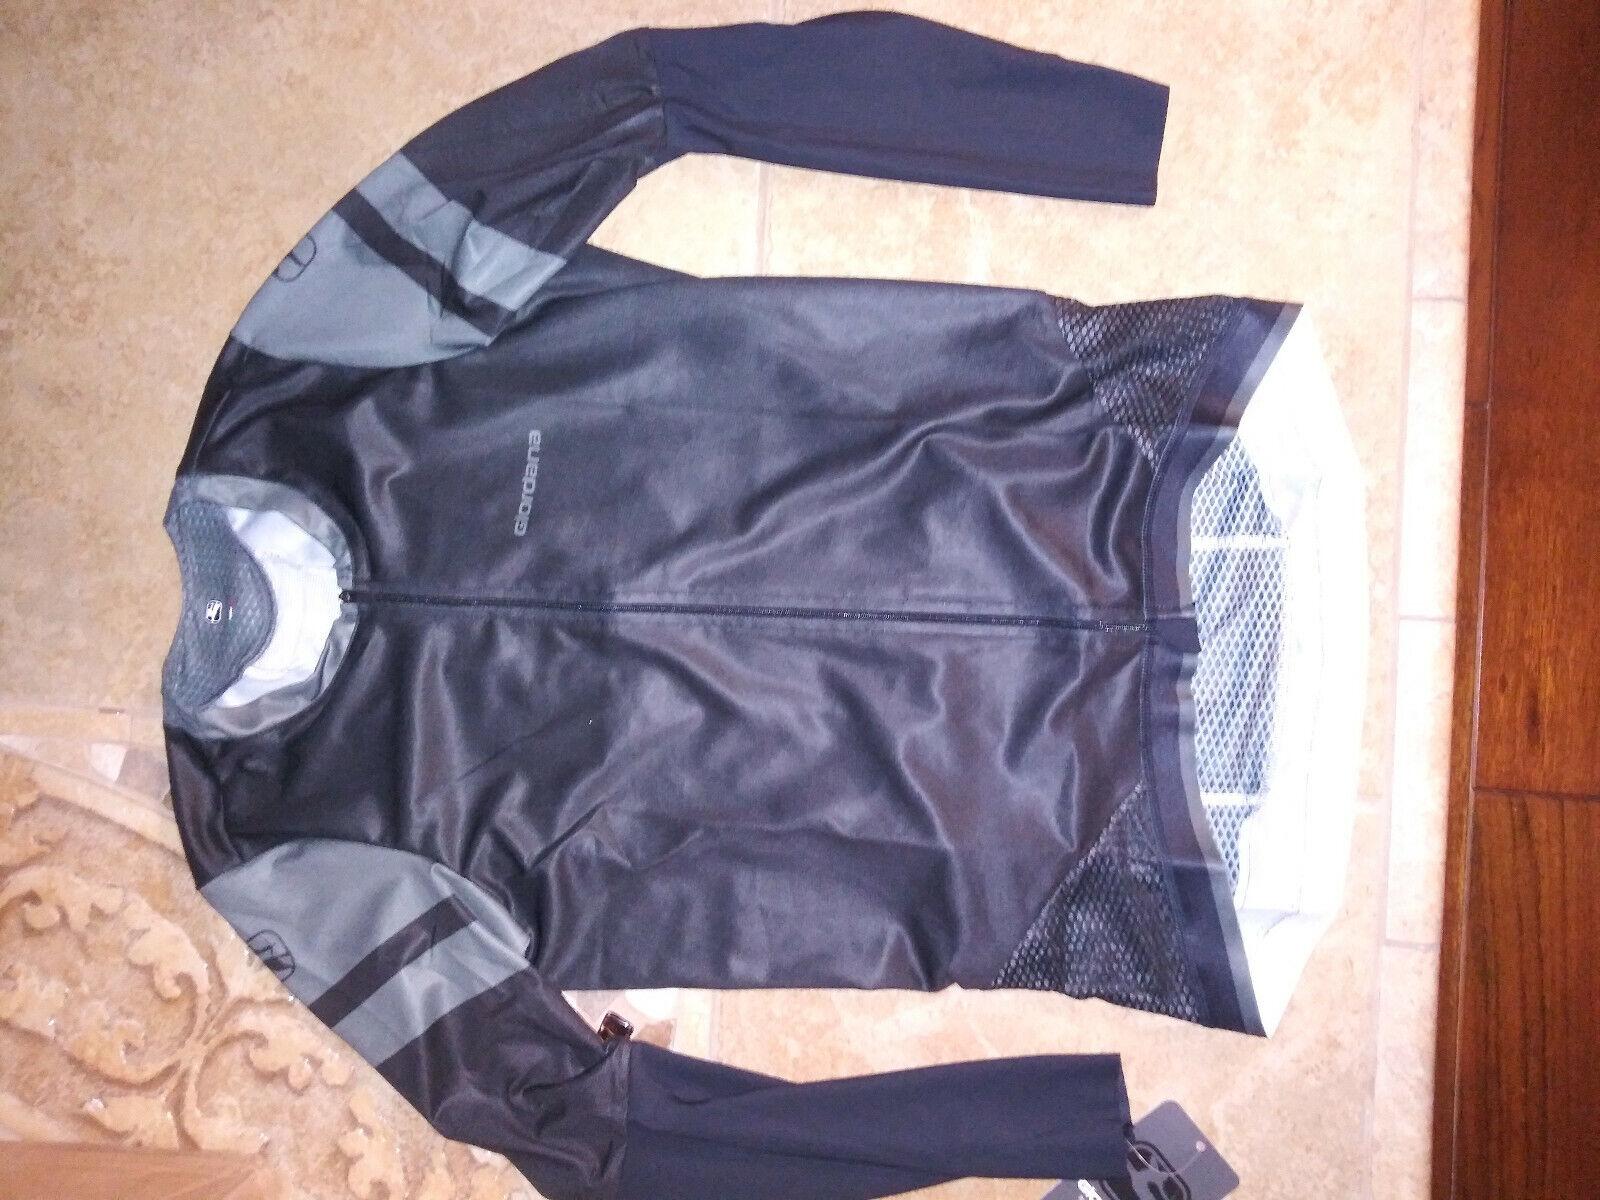 NEW  257 Mens Giordana EXO System Long Sleeve Cycling Jersey, Größe M